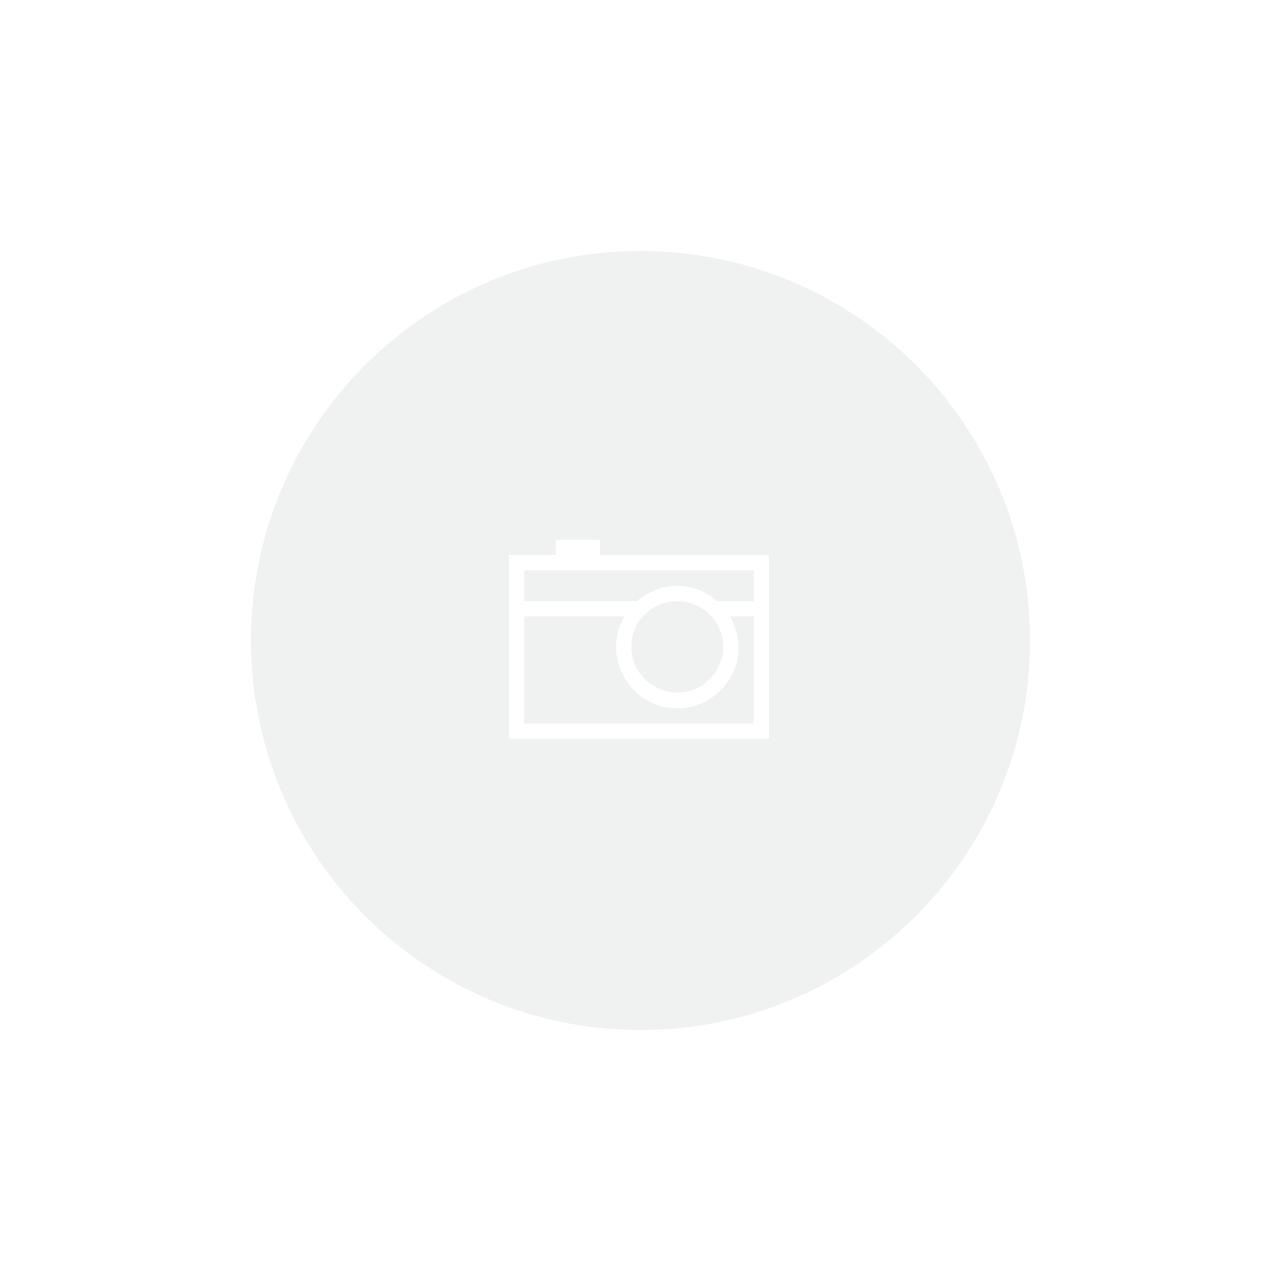 NZXT - PHANTOM 410 BRANCO